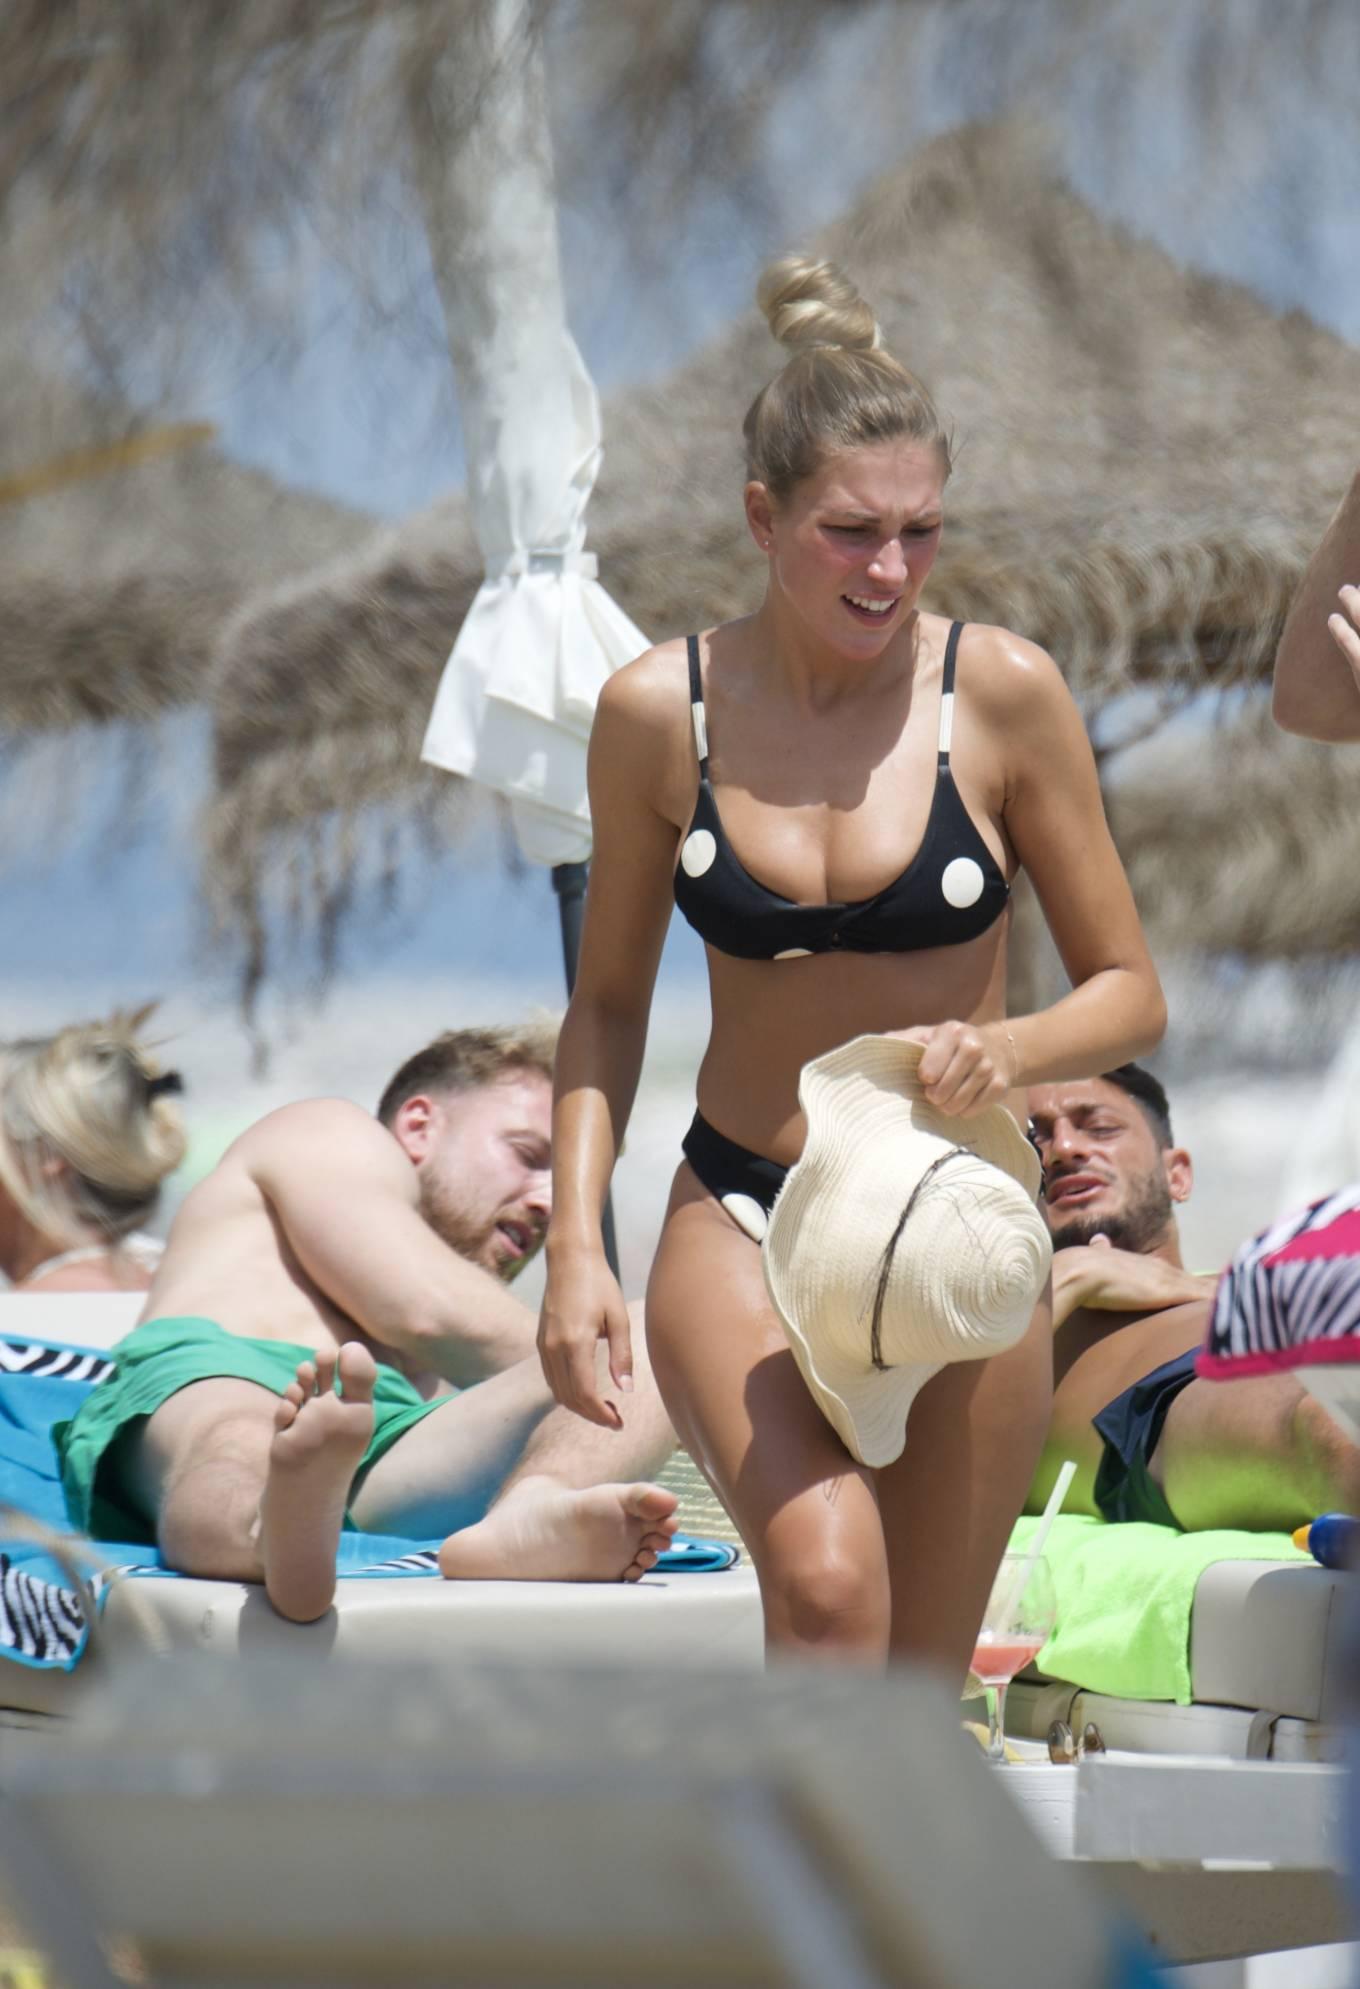 Zara McDermott 2020 : Zara McDermott in Bikini 2020-09